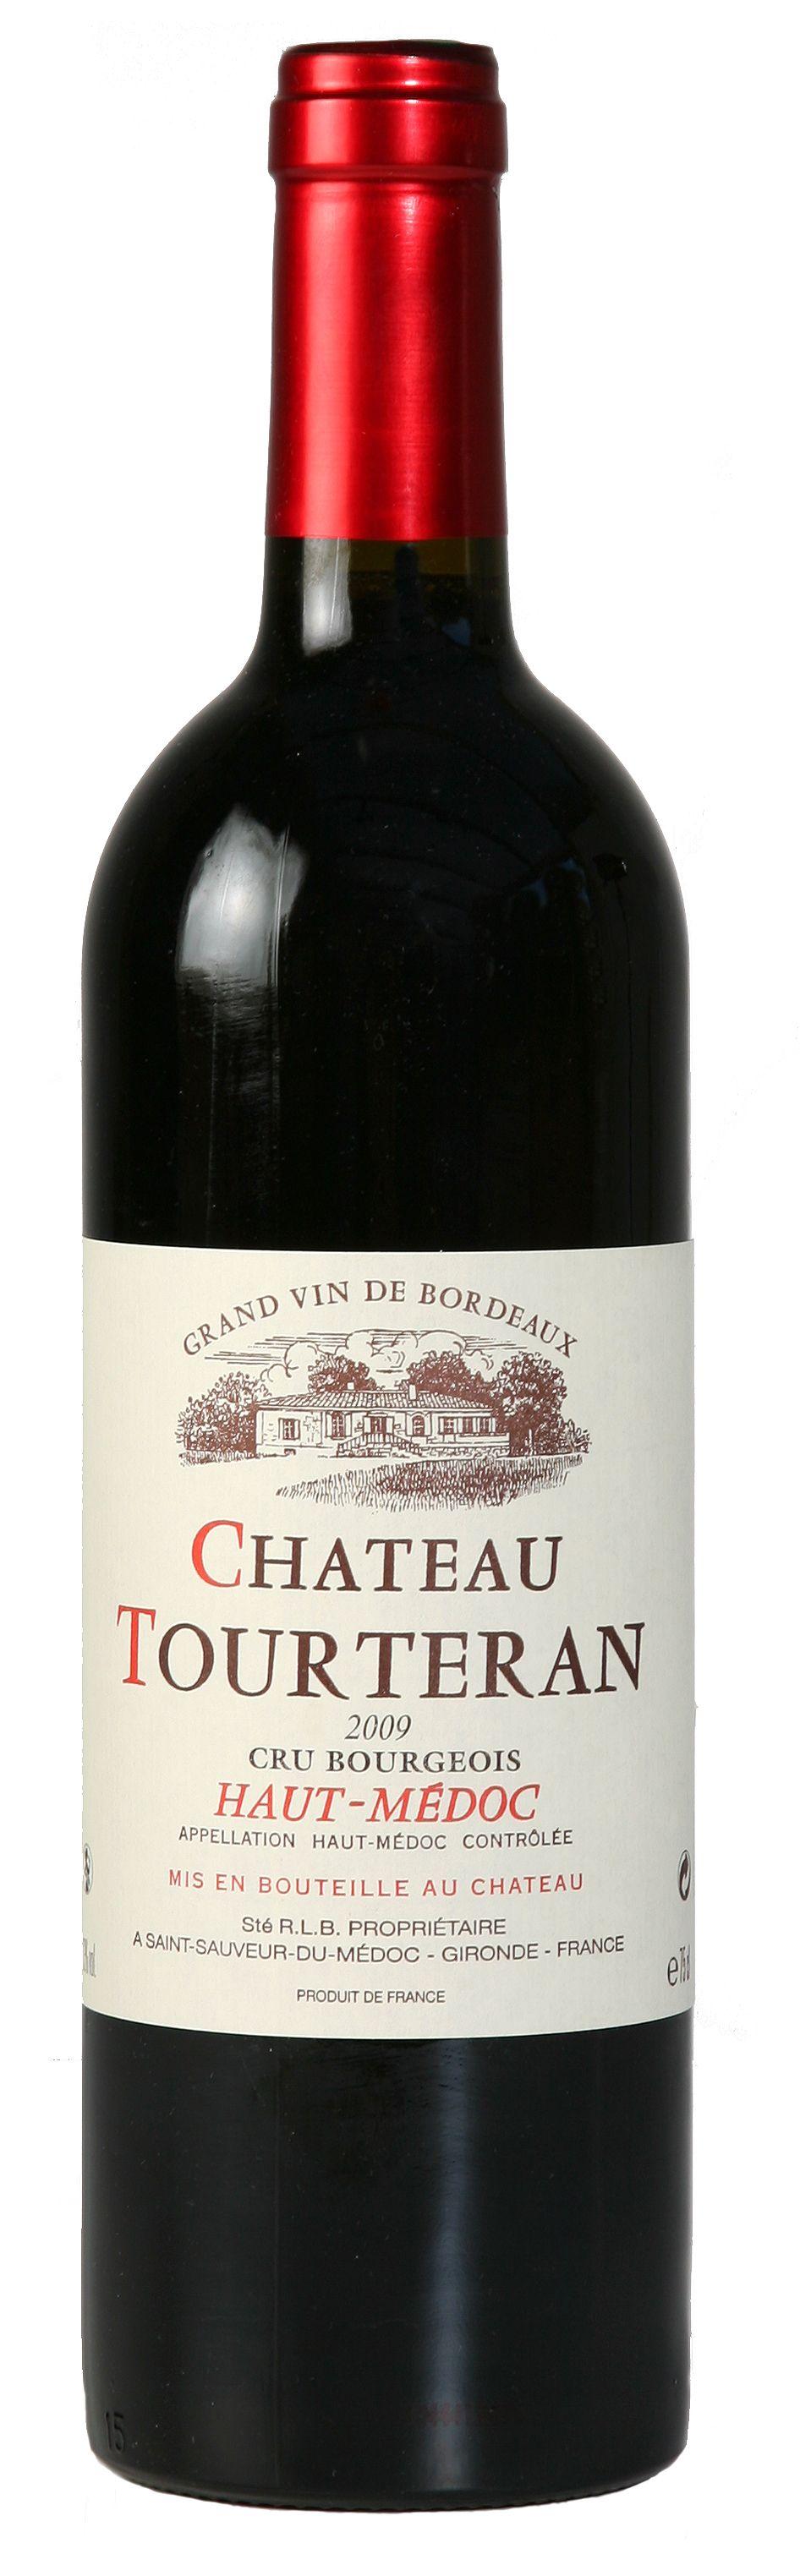 Chateau Tourteran Haut-Medoc